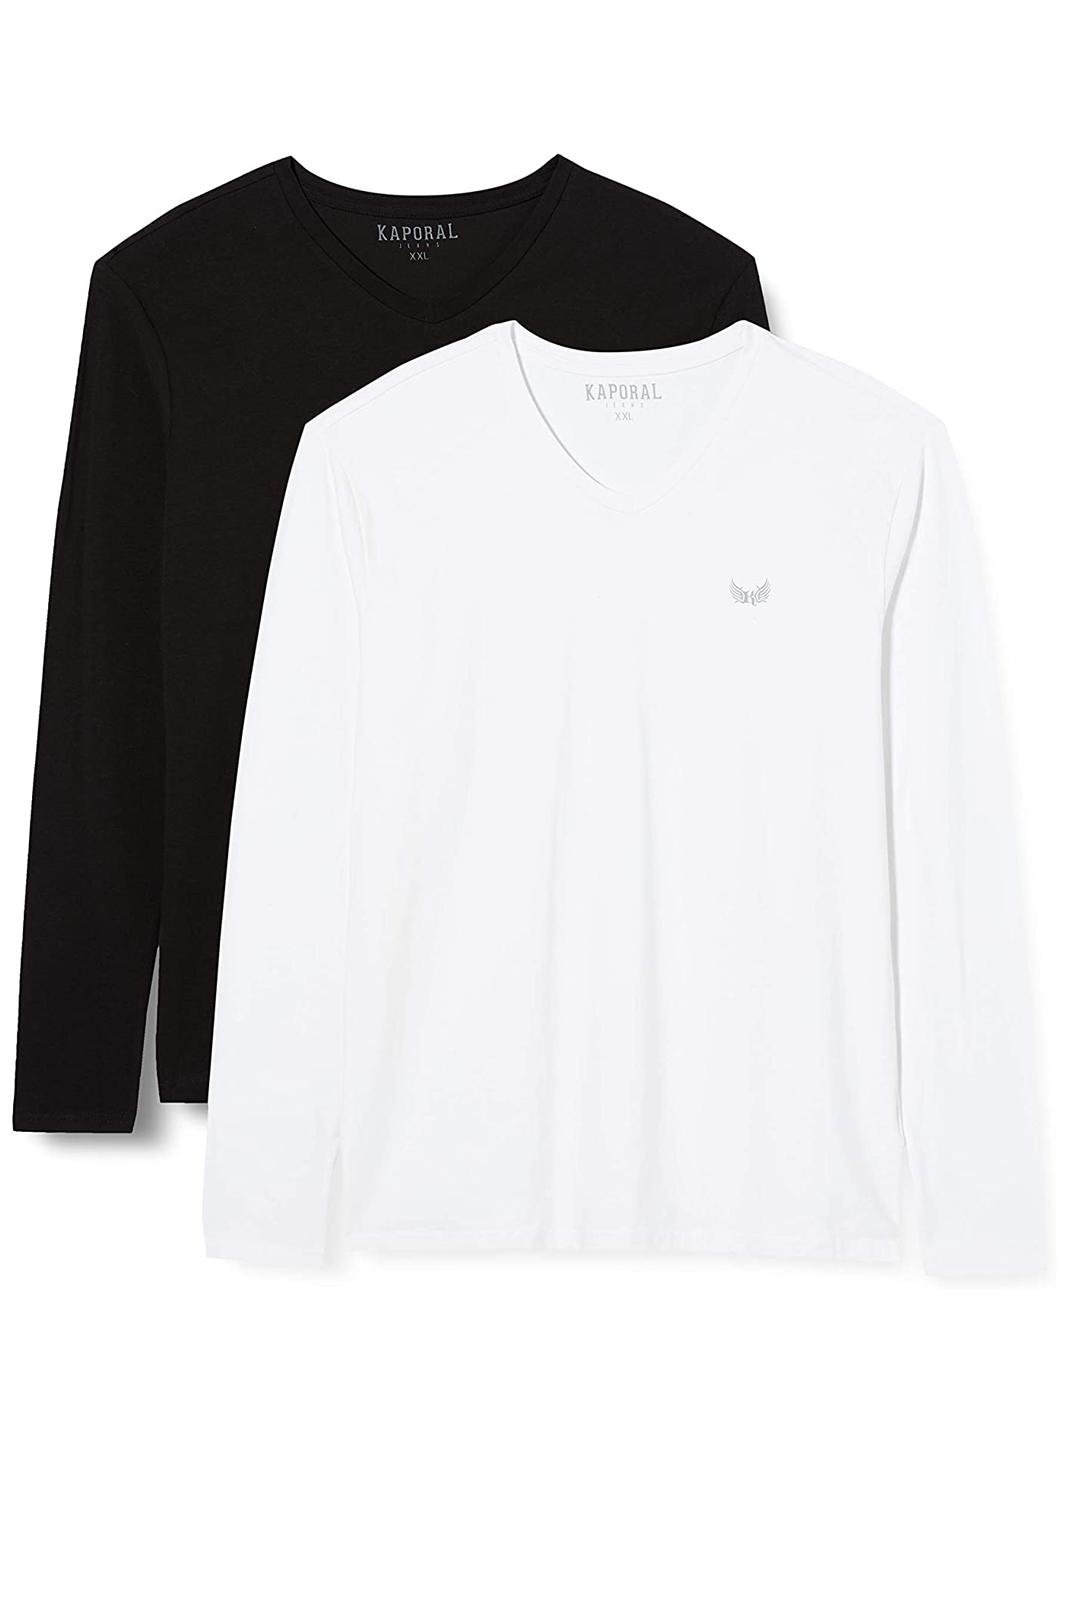 T-S manches longues  Kaporal VIFT WHITE/BLACK